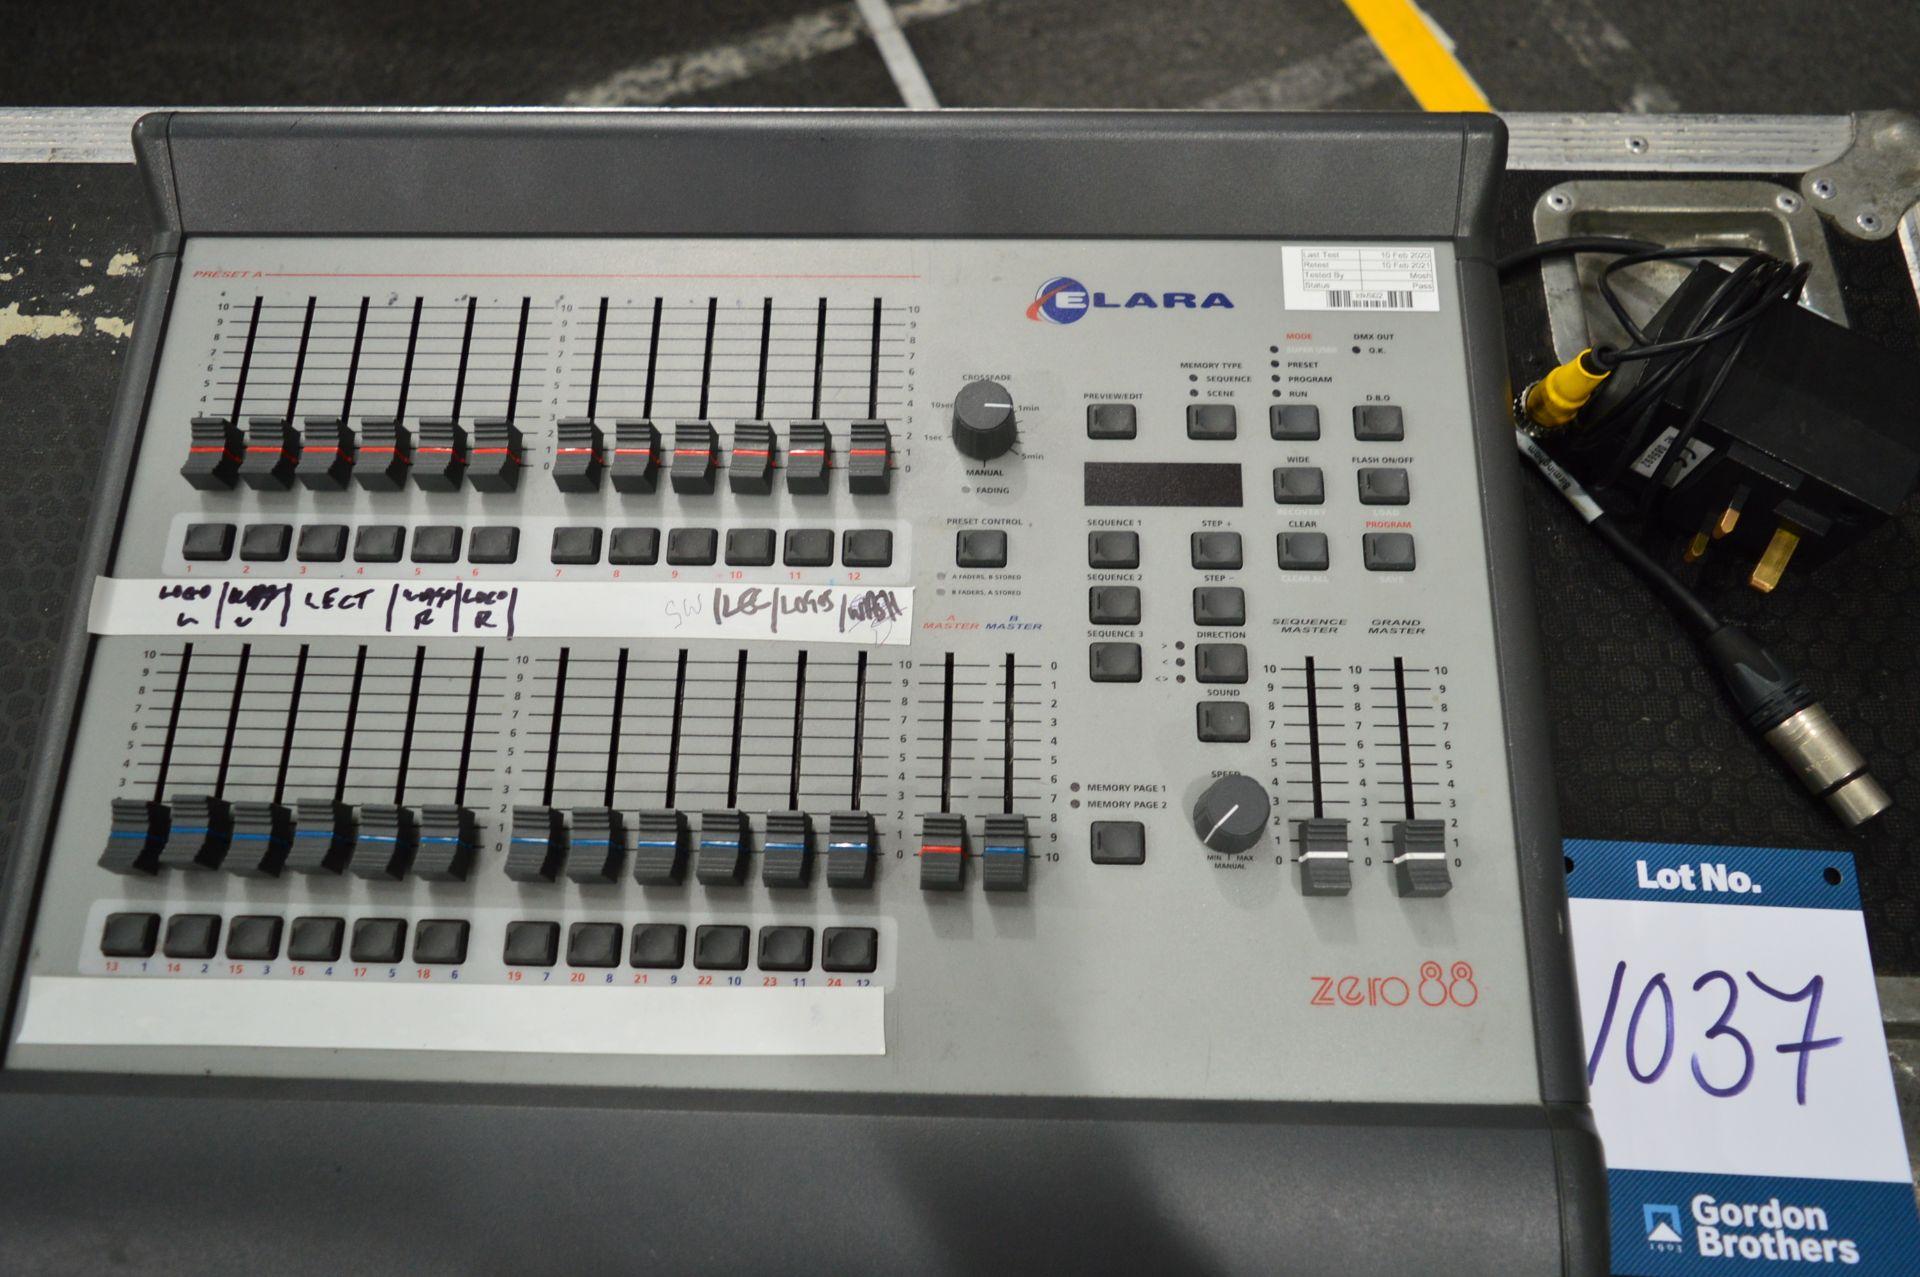 Lot 1037 - Zero88, Elara 12/24 lighting console controller, S